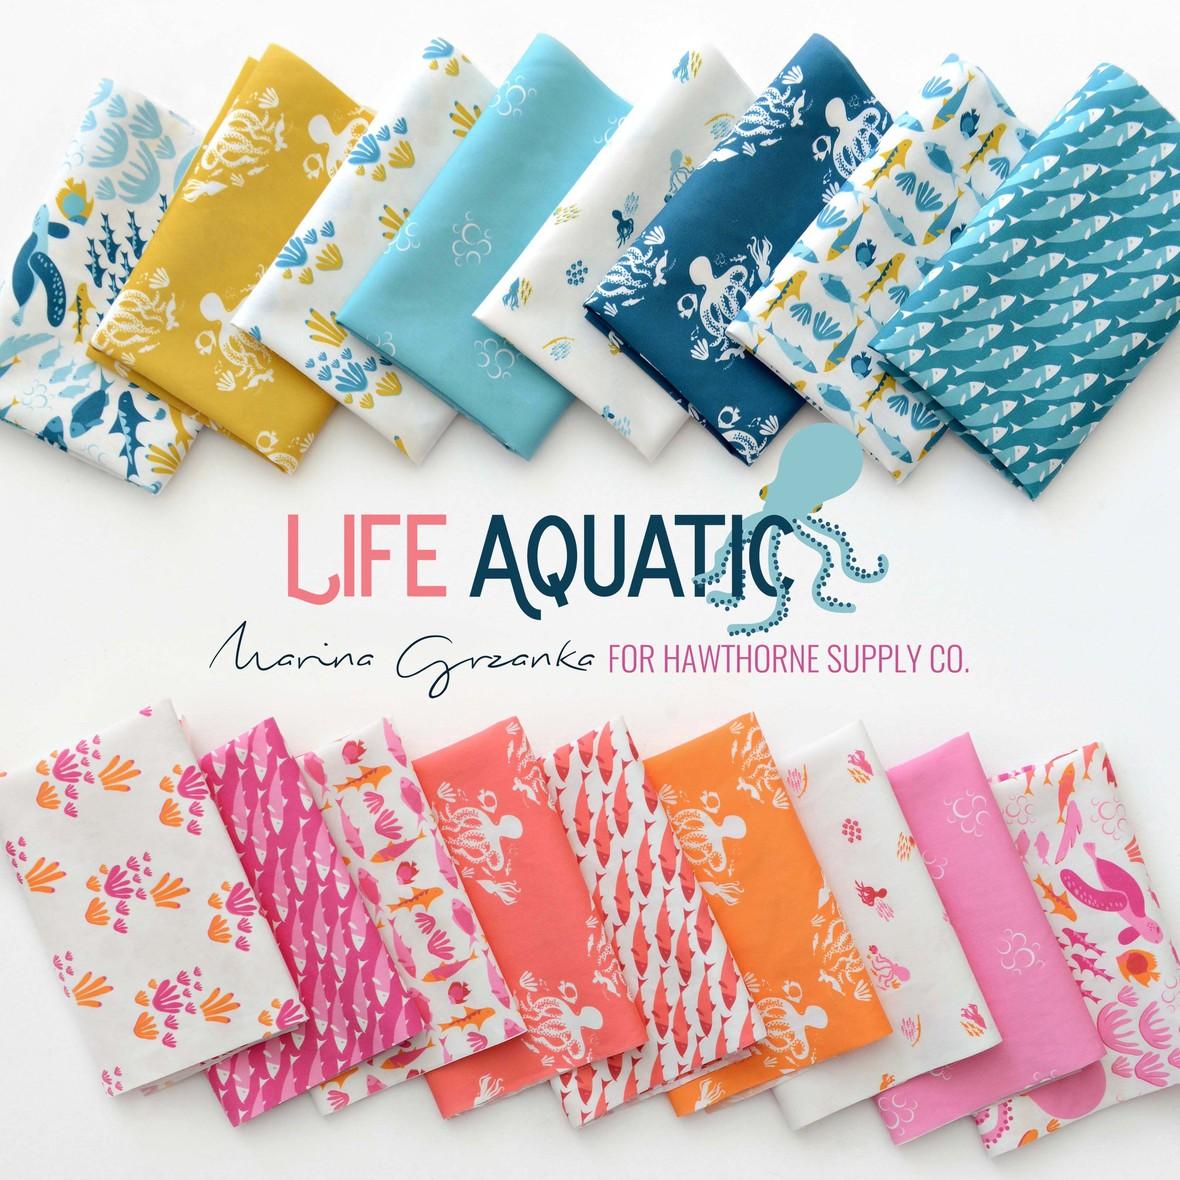 Life Aquatic Fabric Poster Marina Grzanka for Hawthorne Supply Co 1